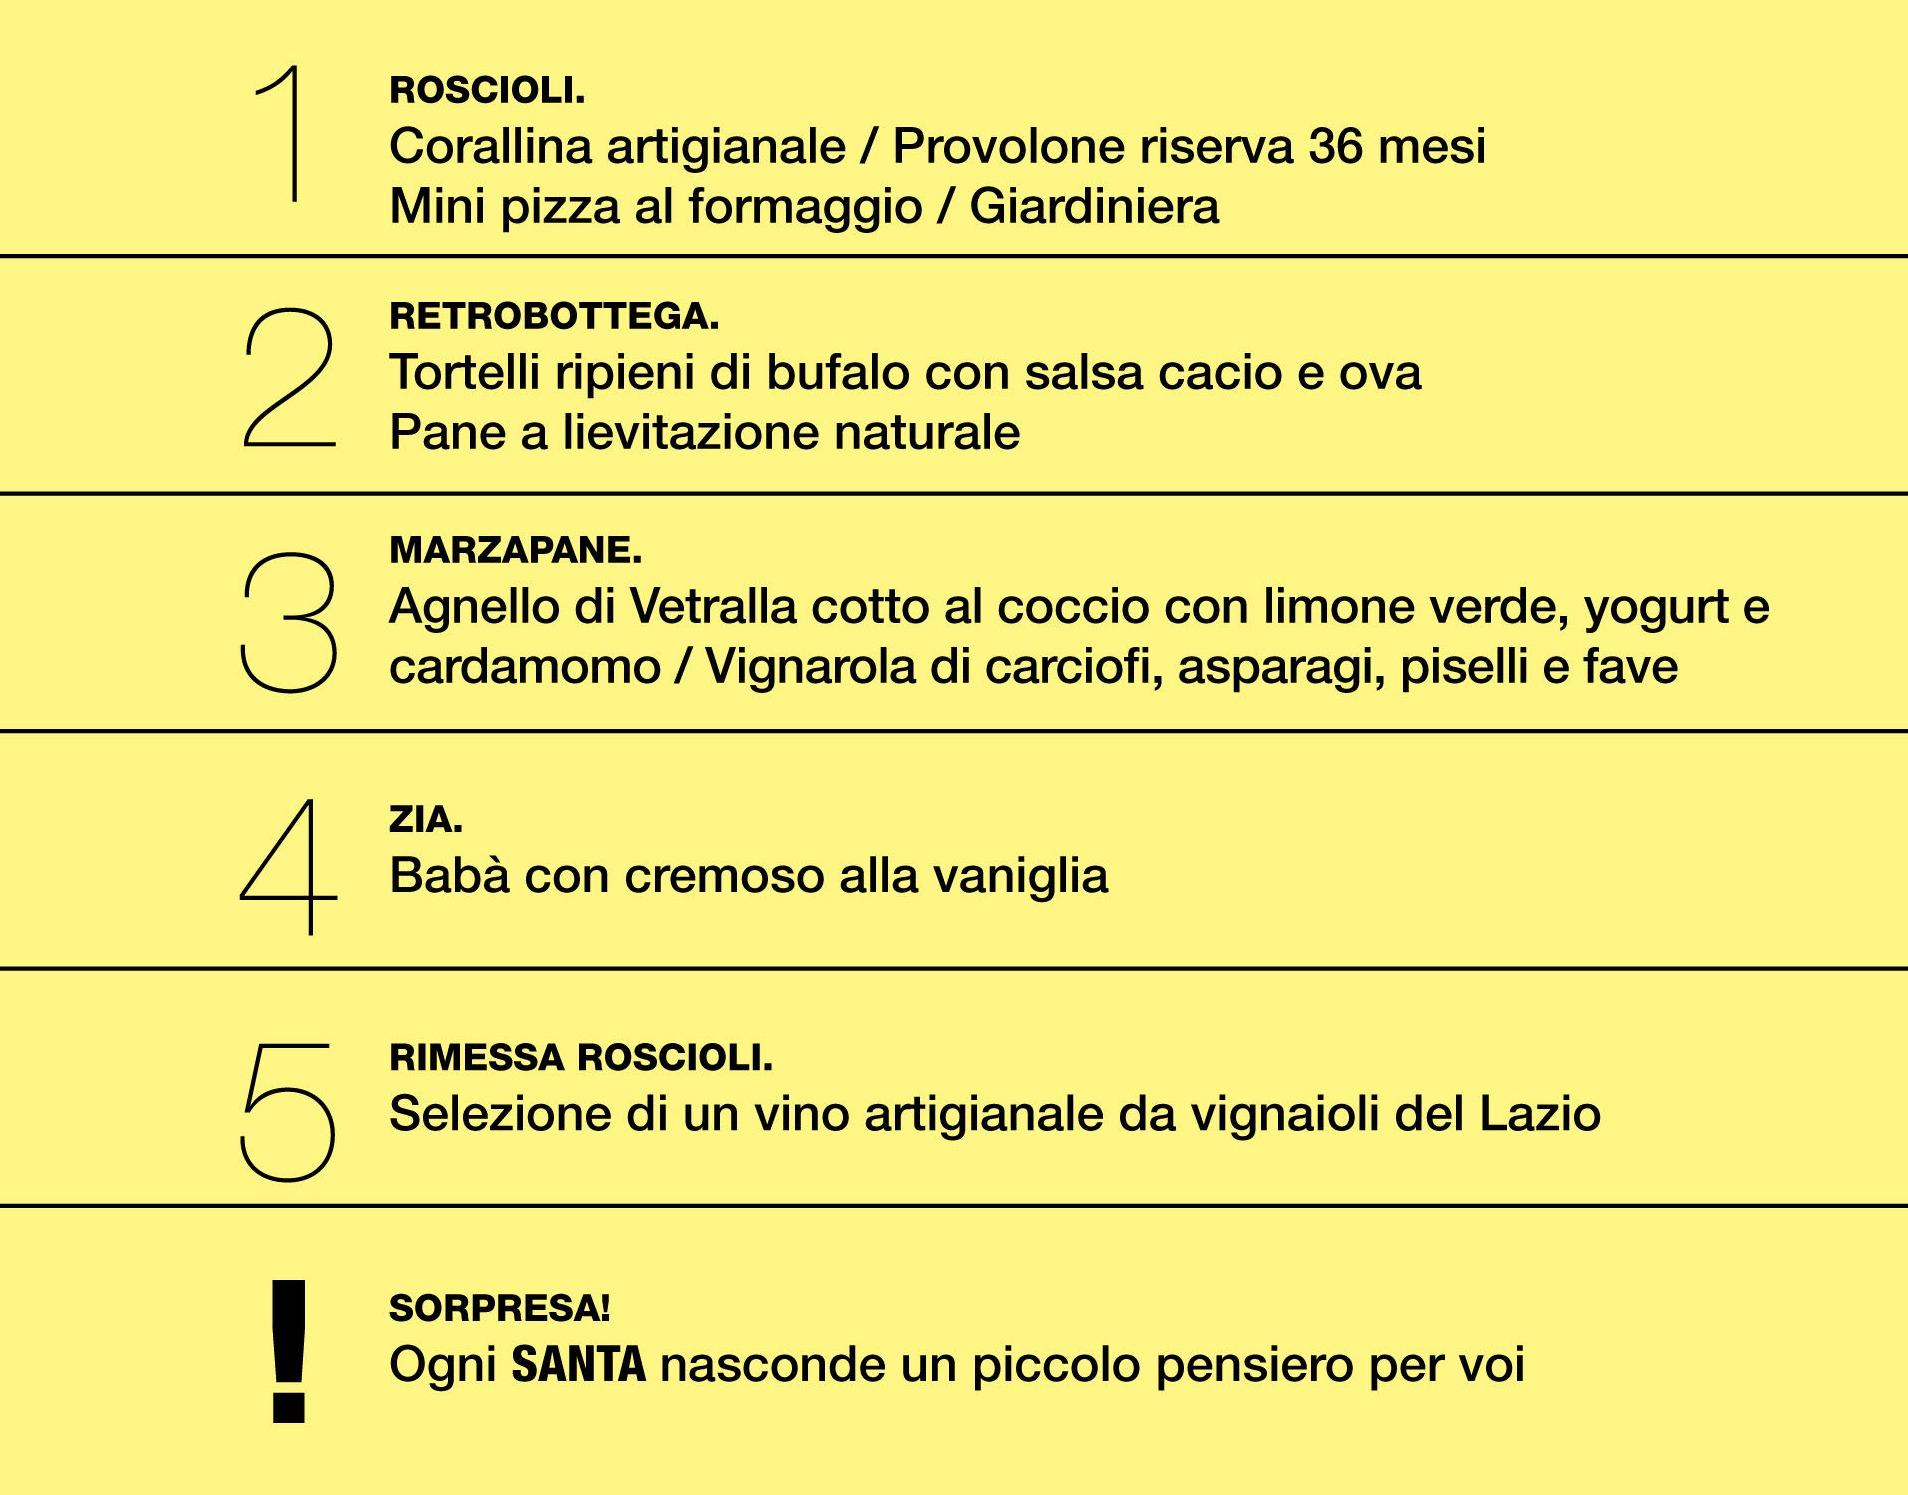 SantaPa5quaMenu05